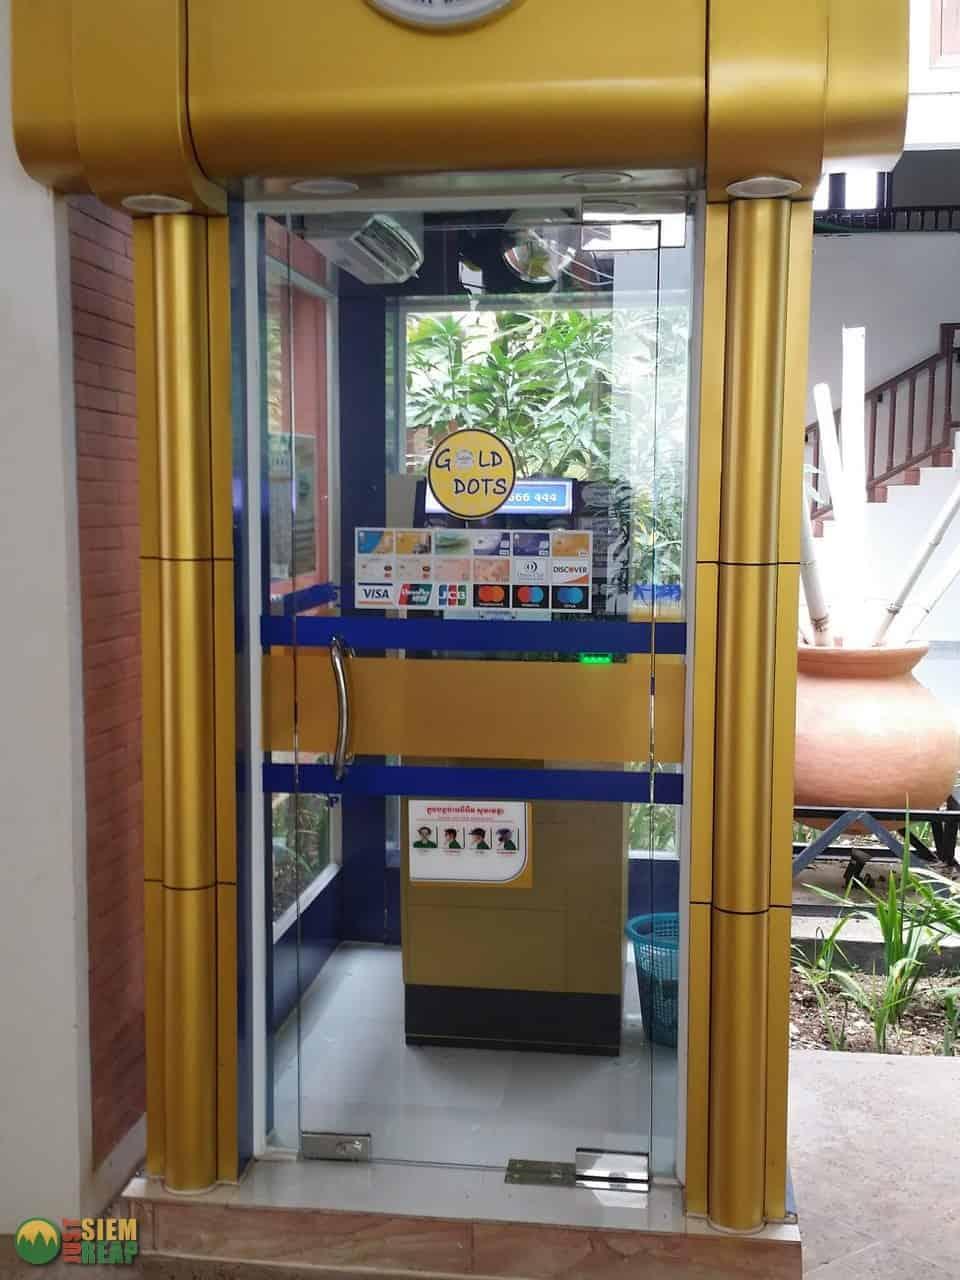 Gold Dots ATM